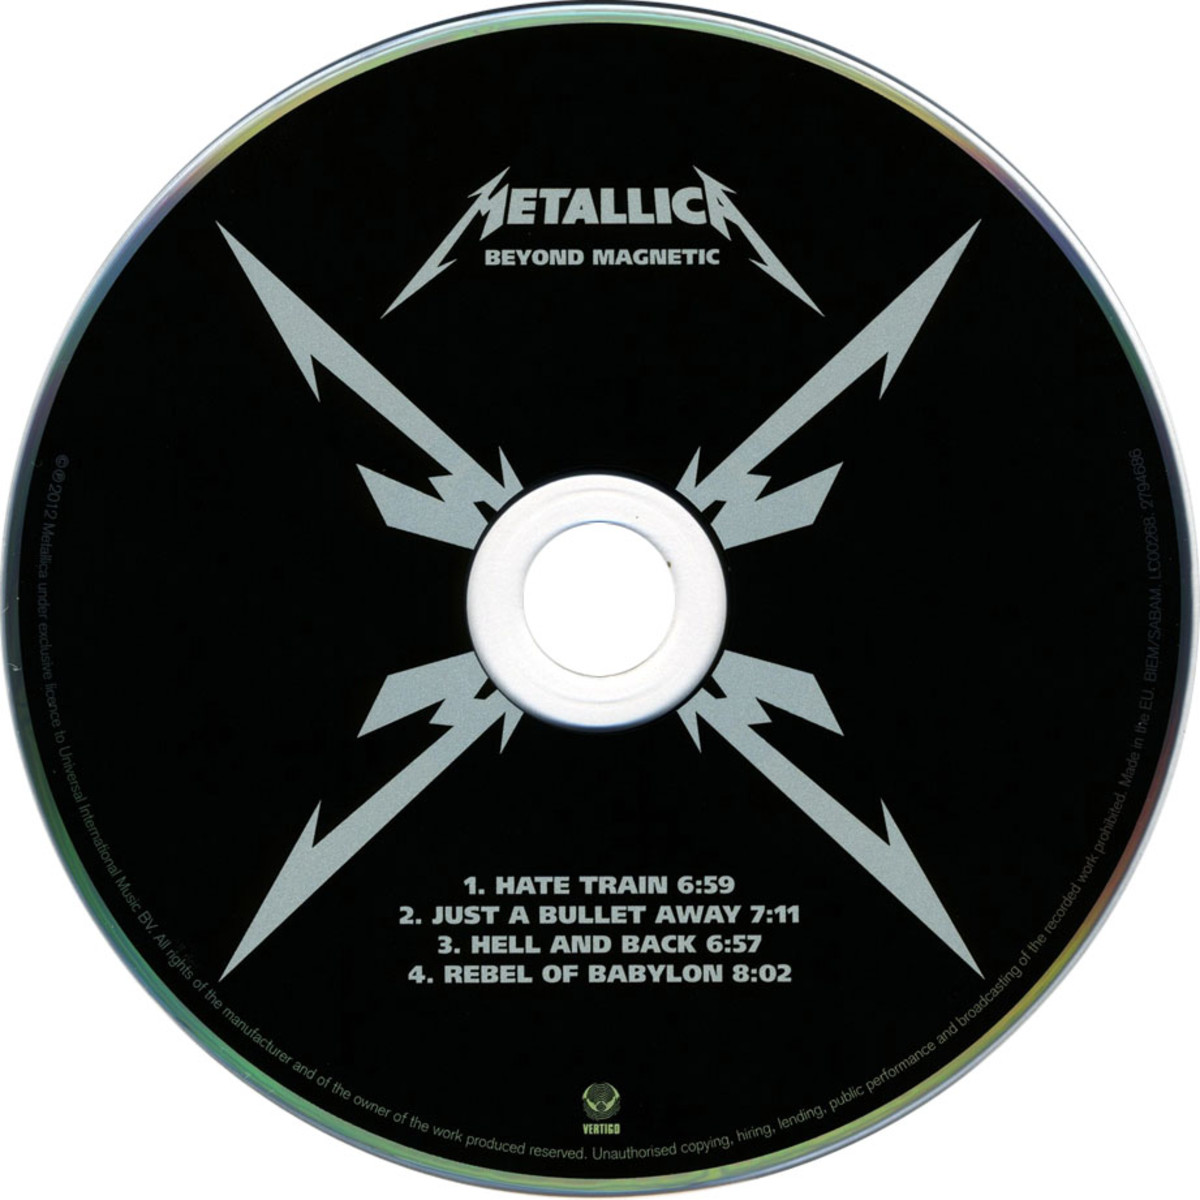 metallica-beyond-magnetic-a-forgotten-mini-album